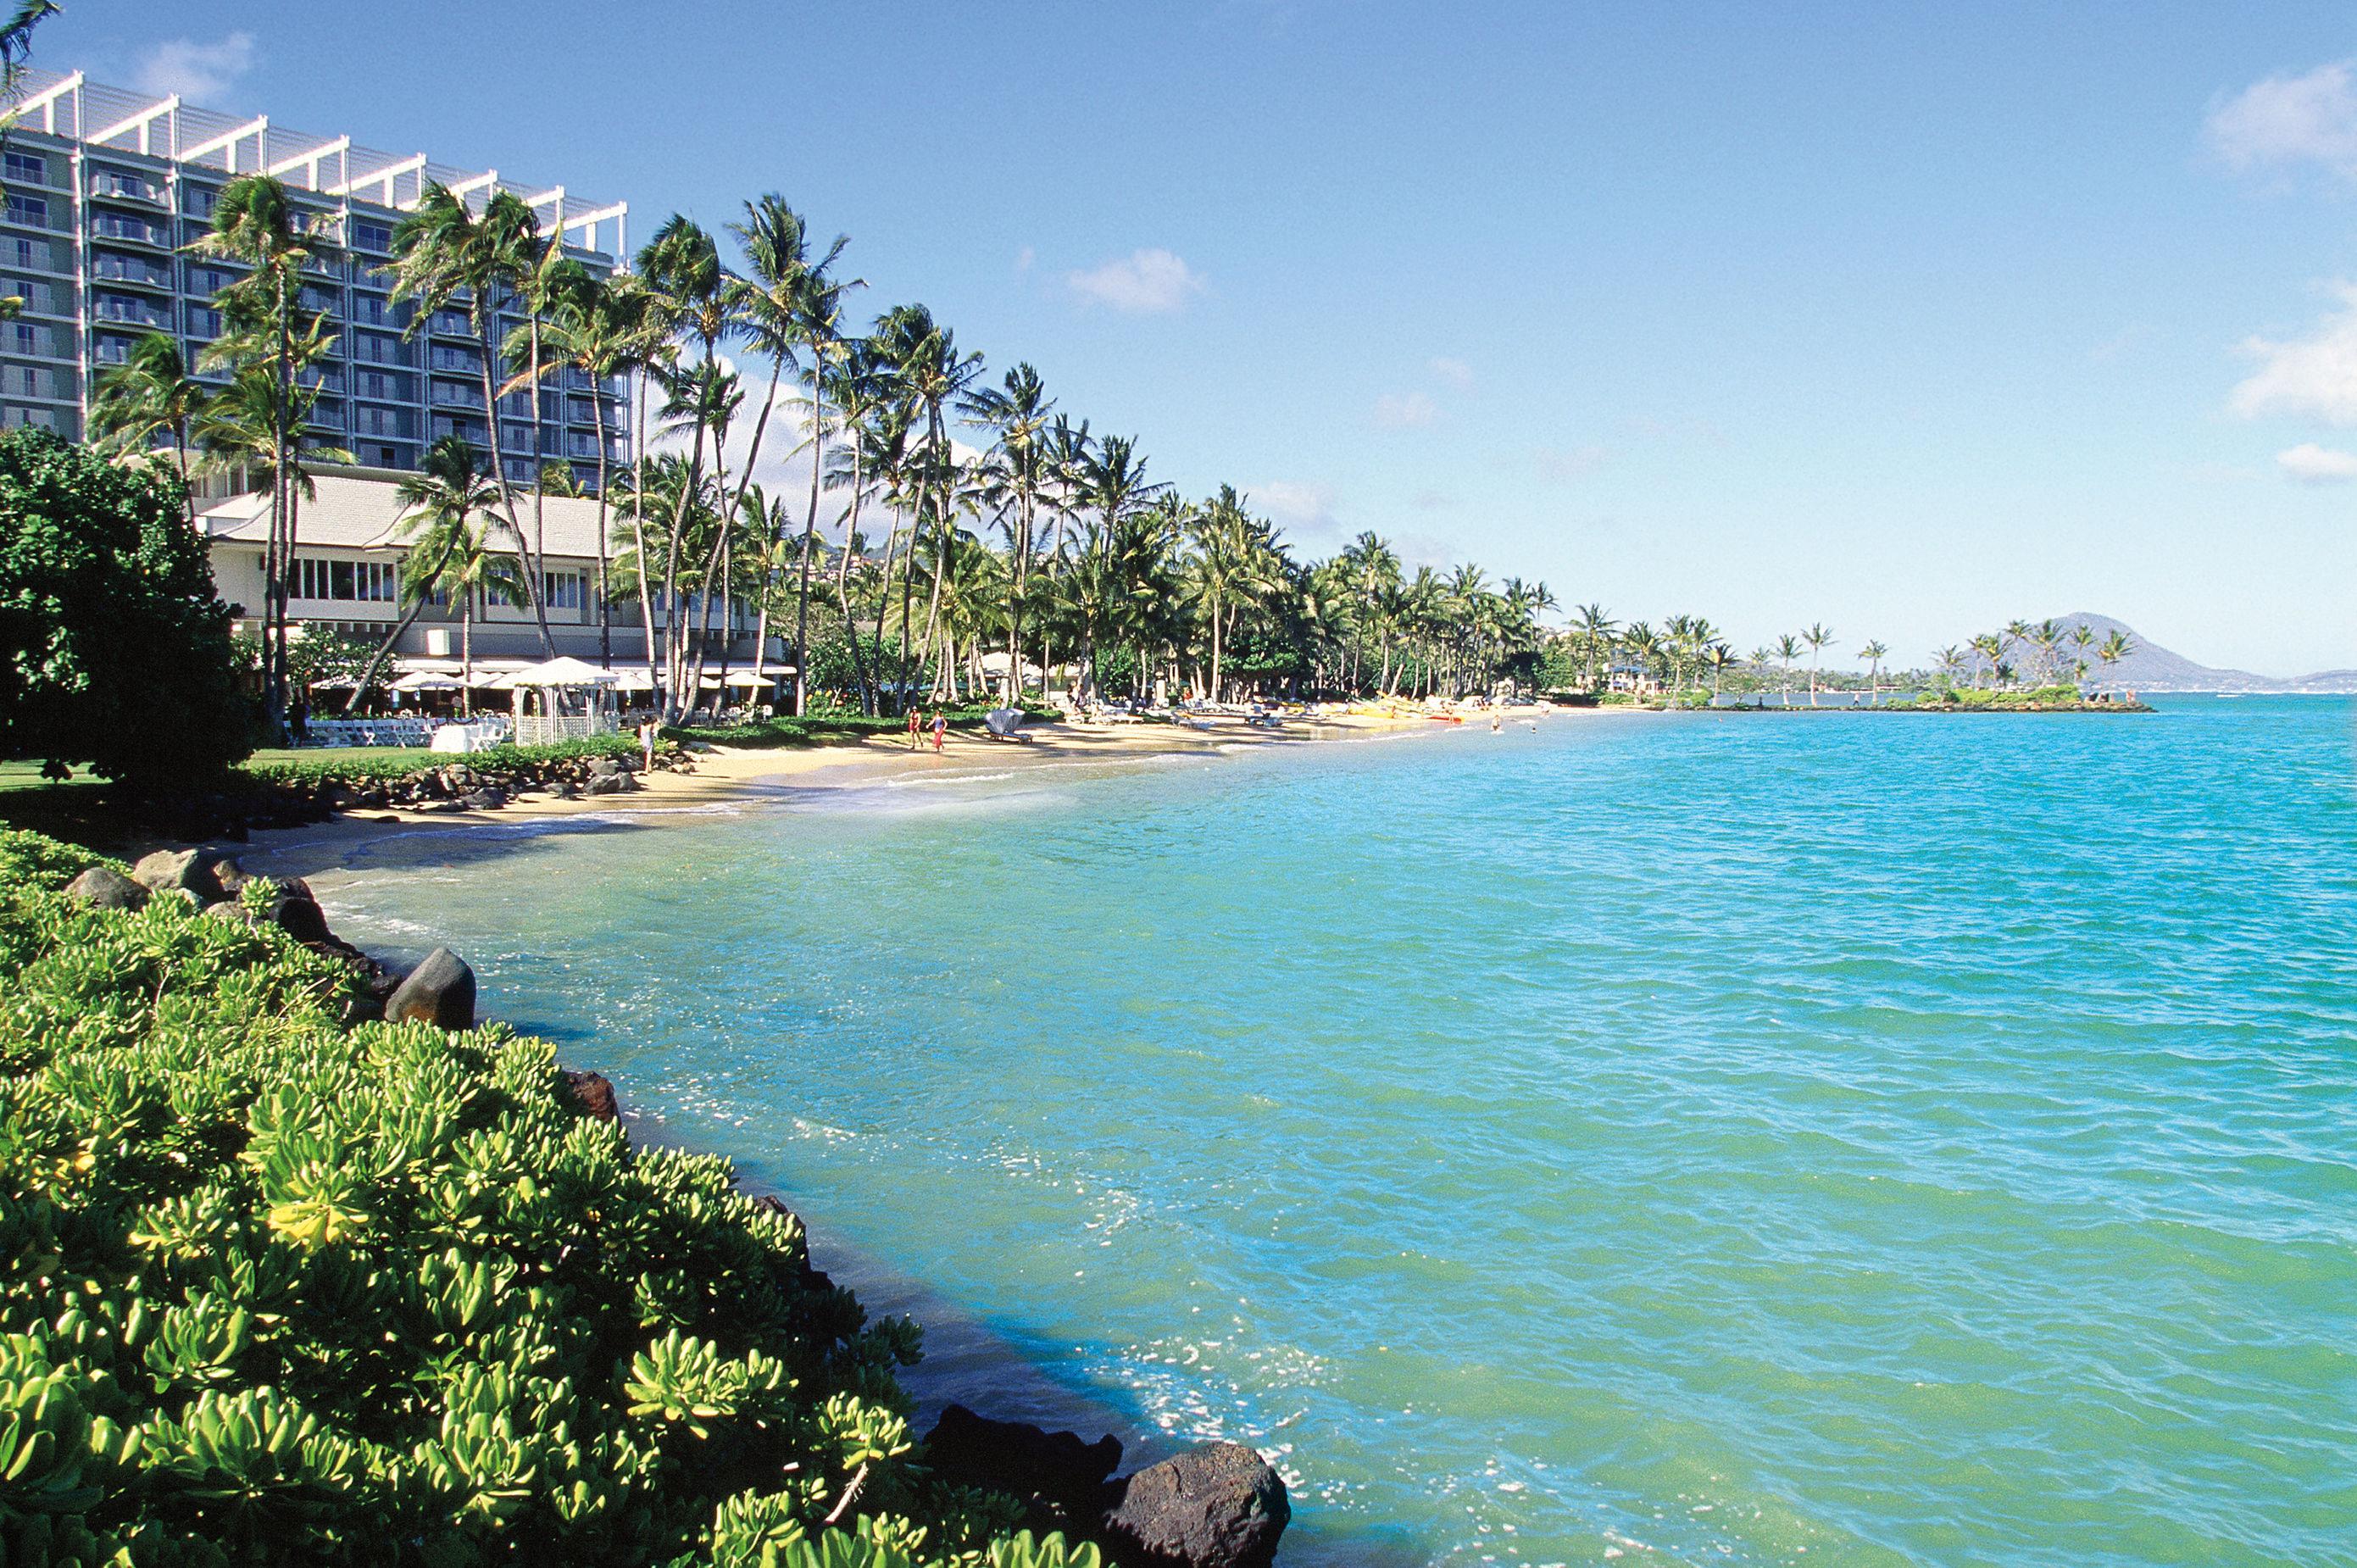 Pomo 0112 sunshine hawaii nqxvtj